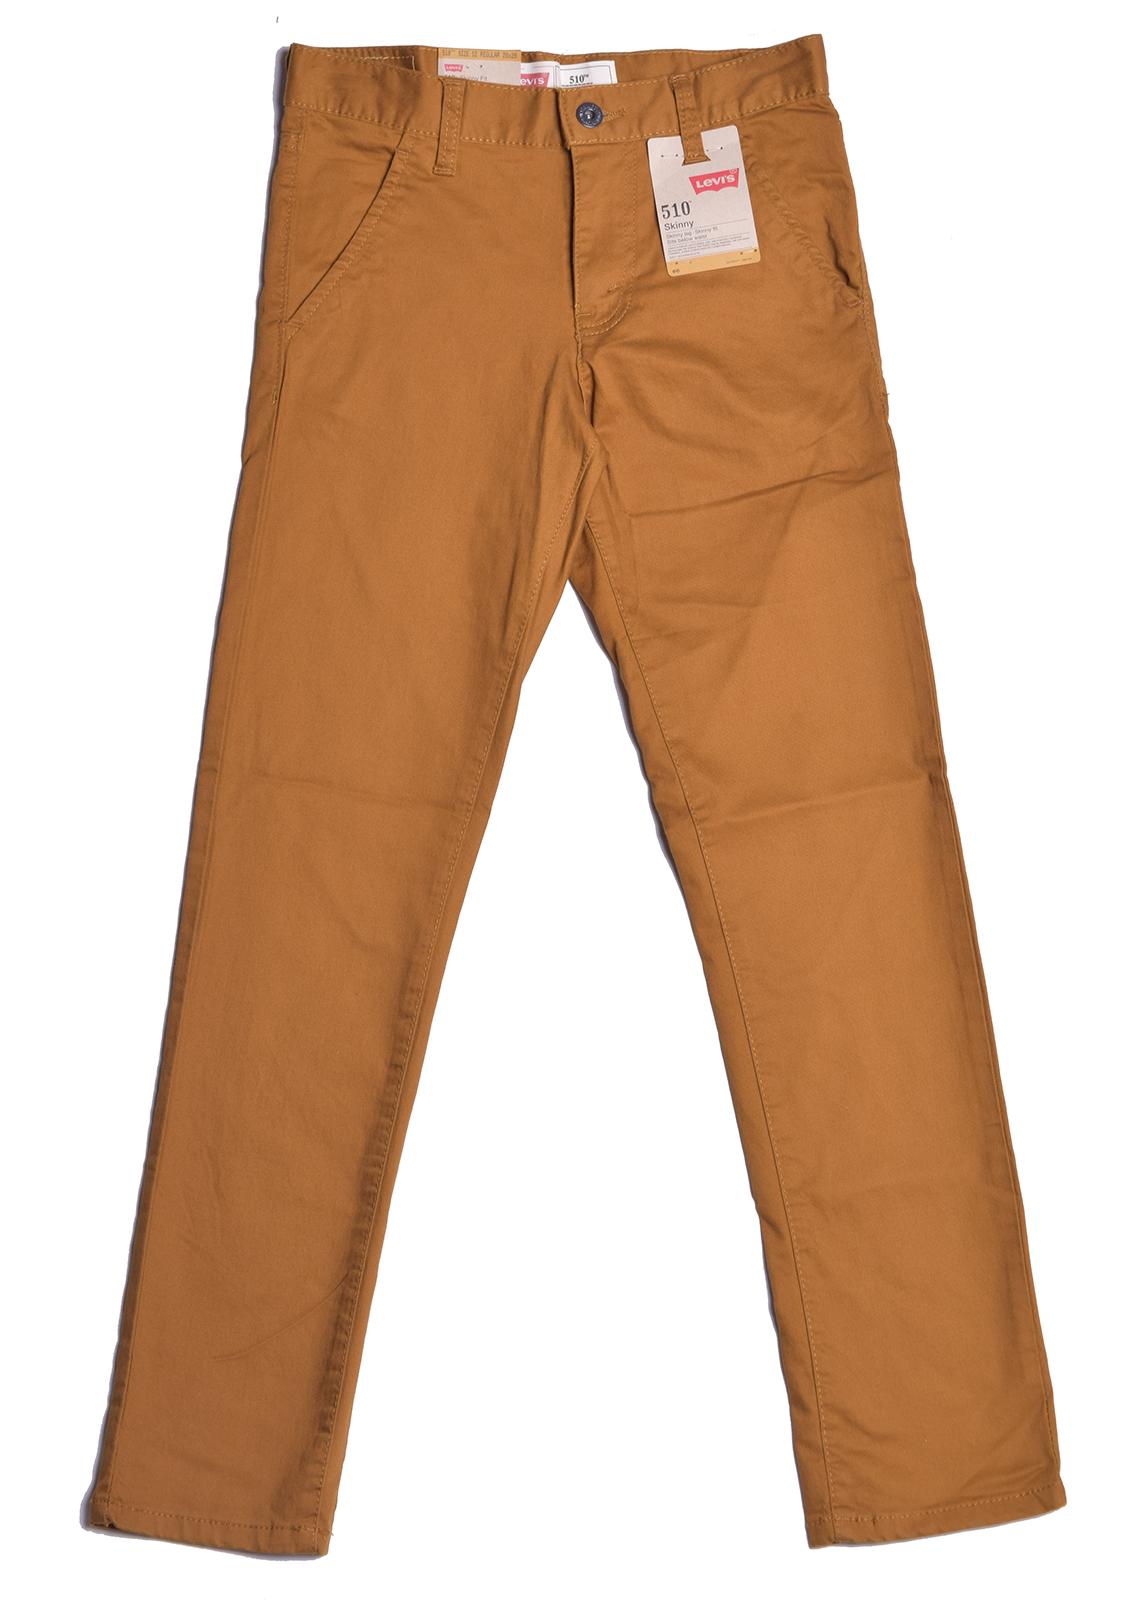 Levis Boyu0026#39;s 510 Skinny Fit Pants Jeans | eBay